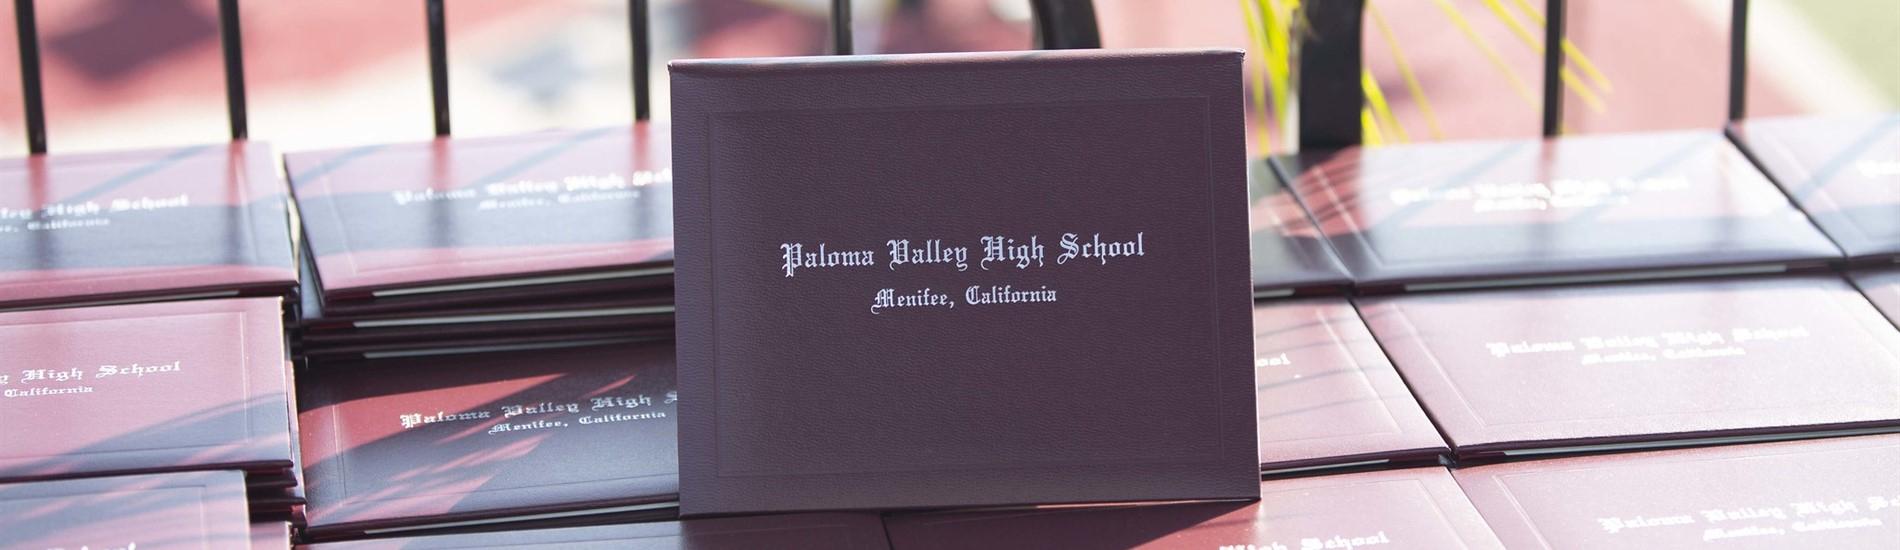 Home - Paloma Valley High School Throughout Paloma High School Menifee Year School Calendar